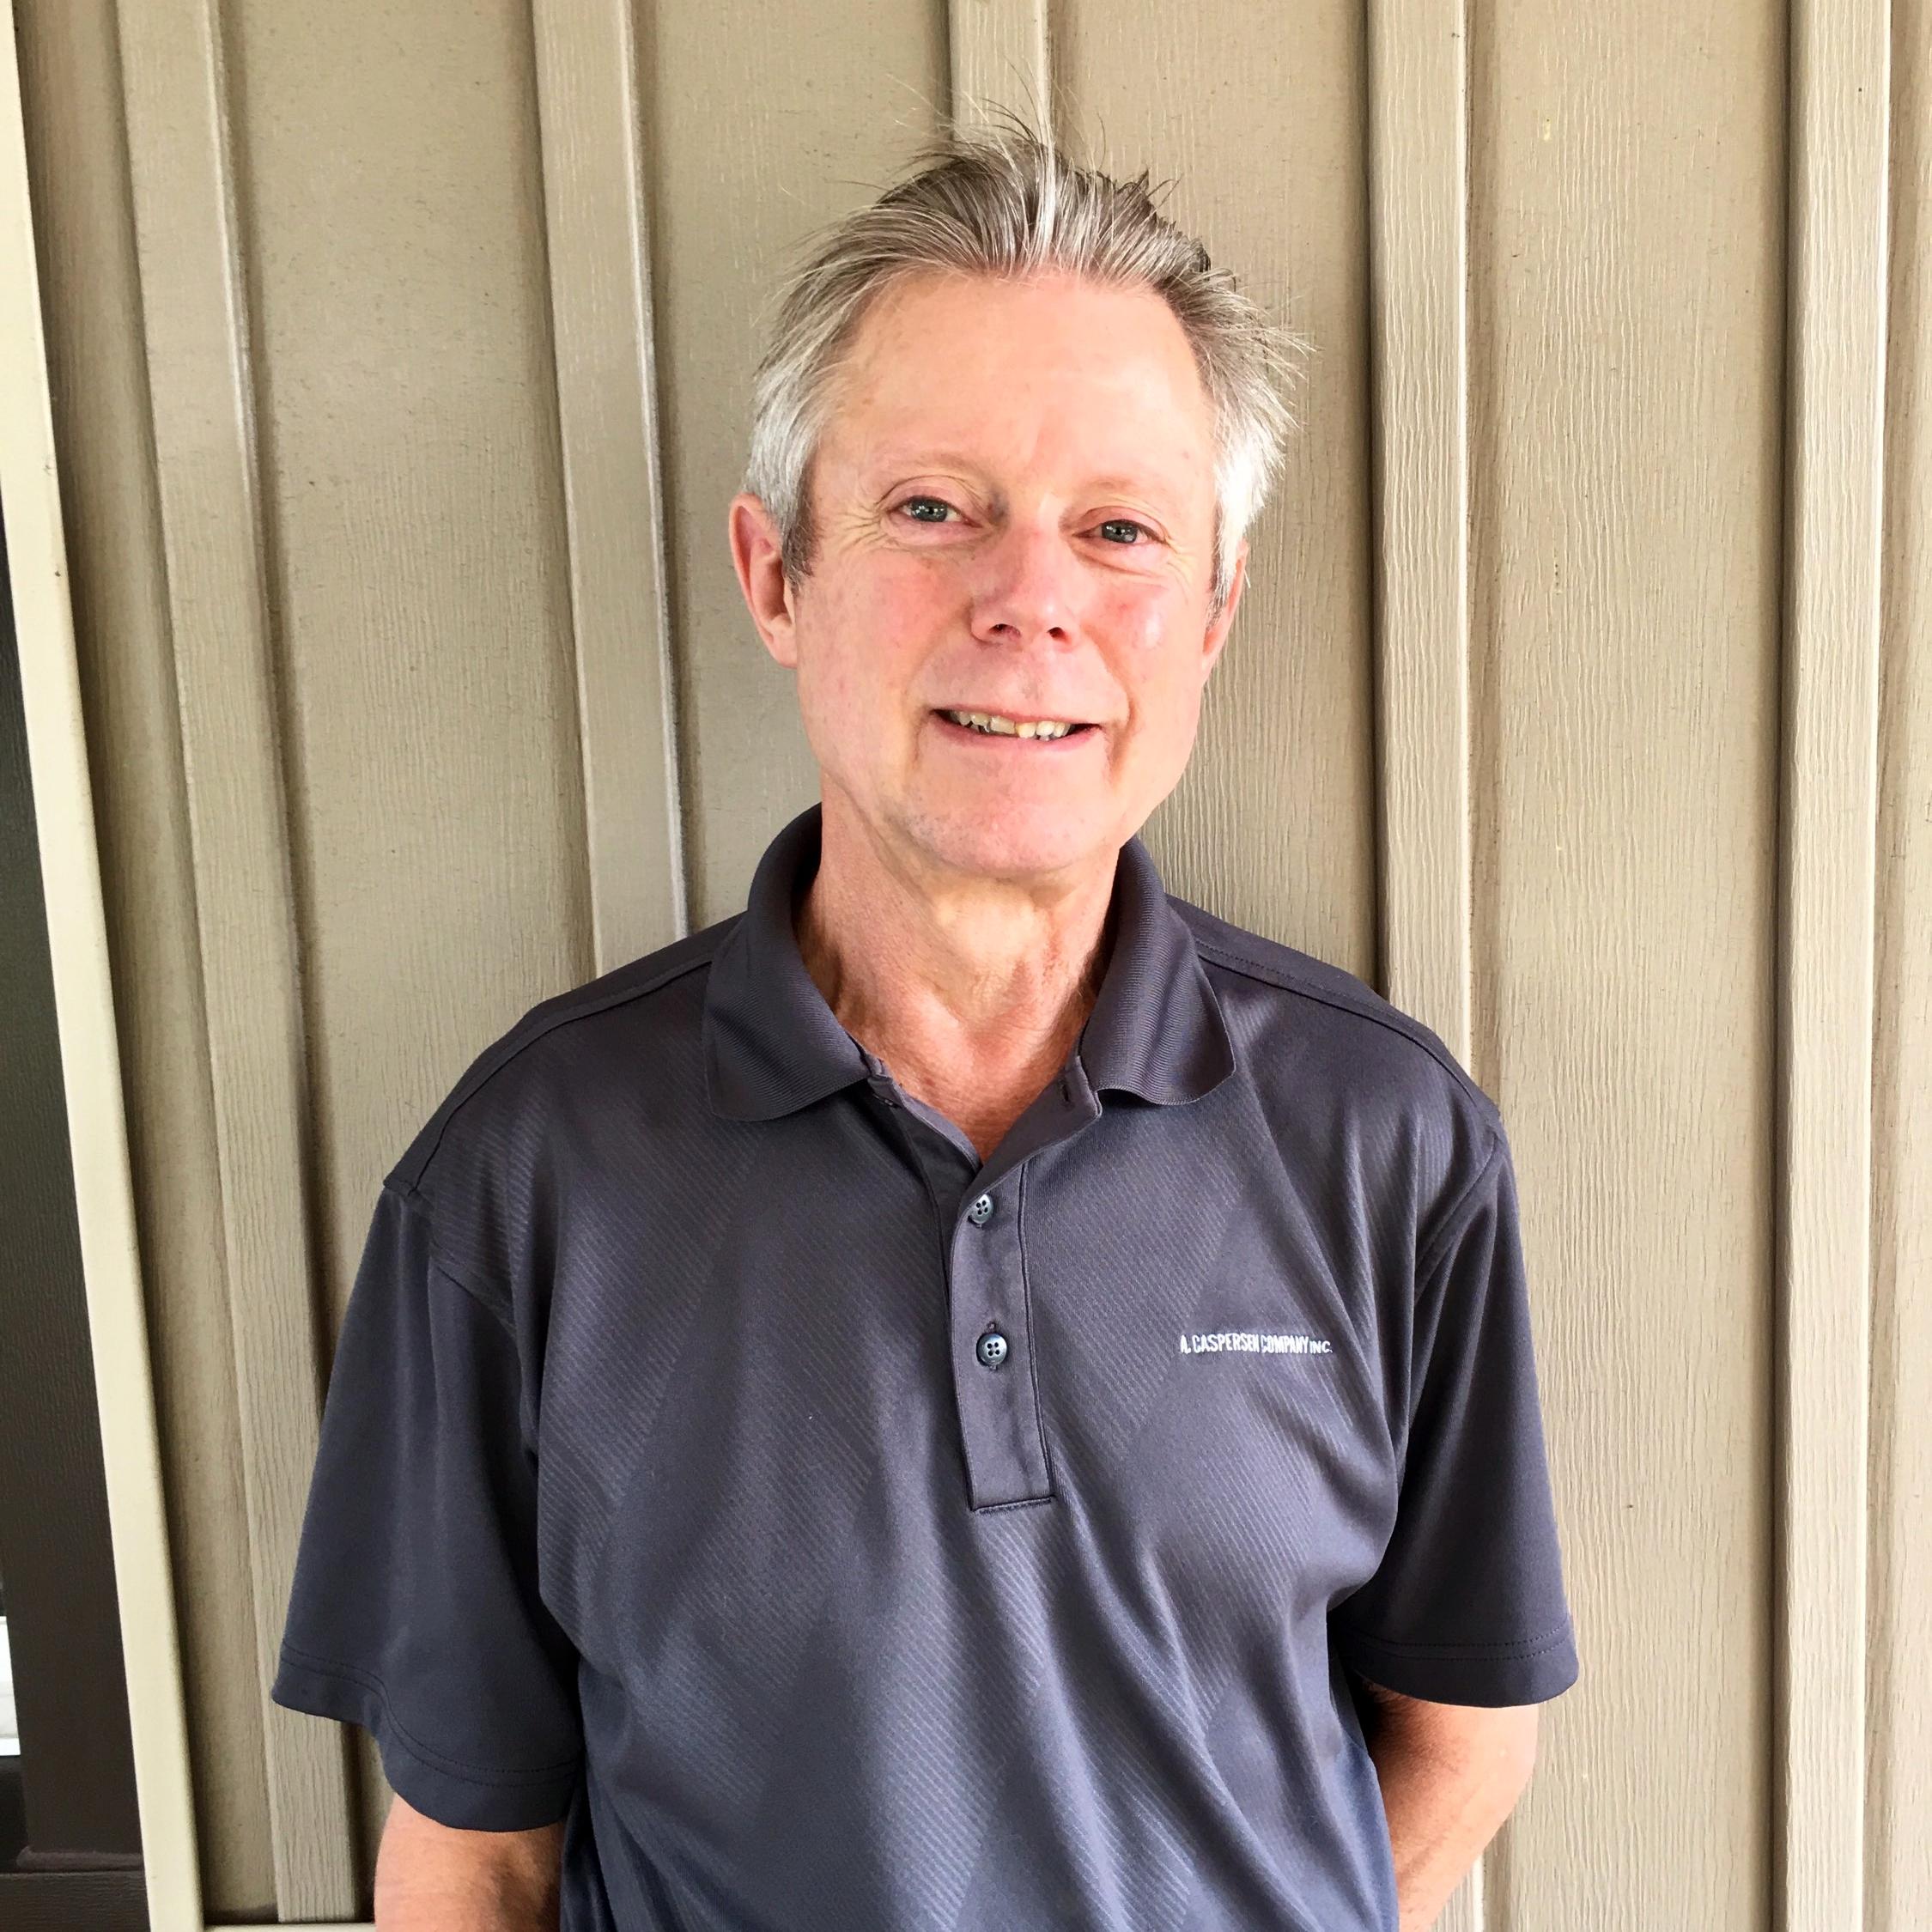 Martin Caspersen - Operations Manager